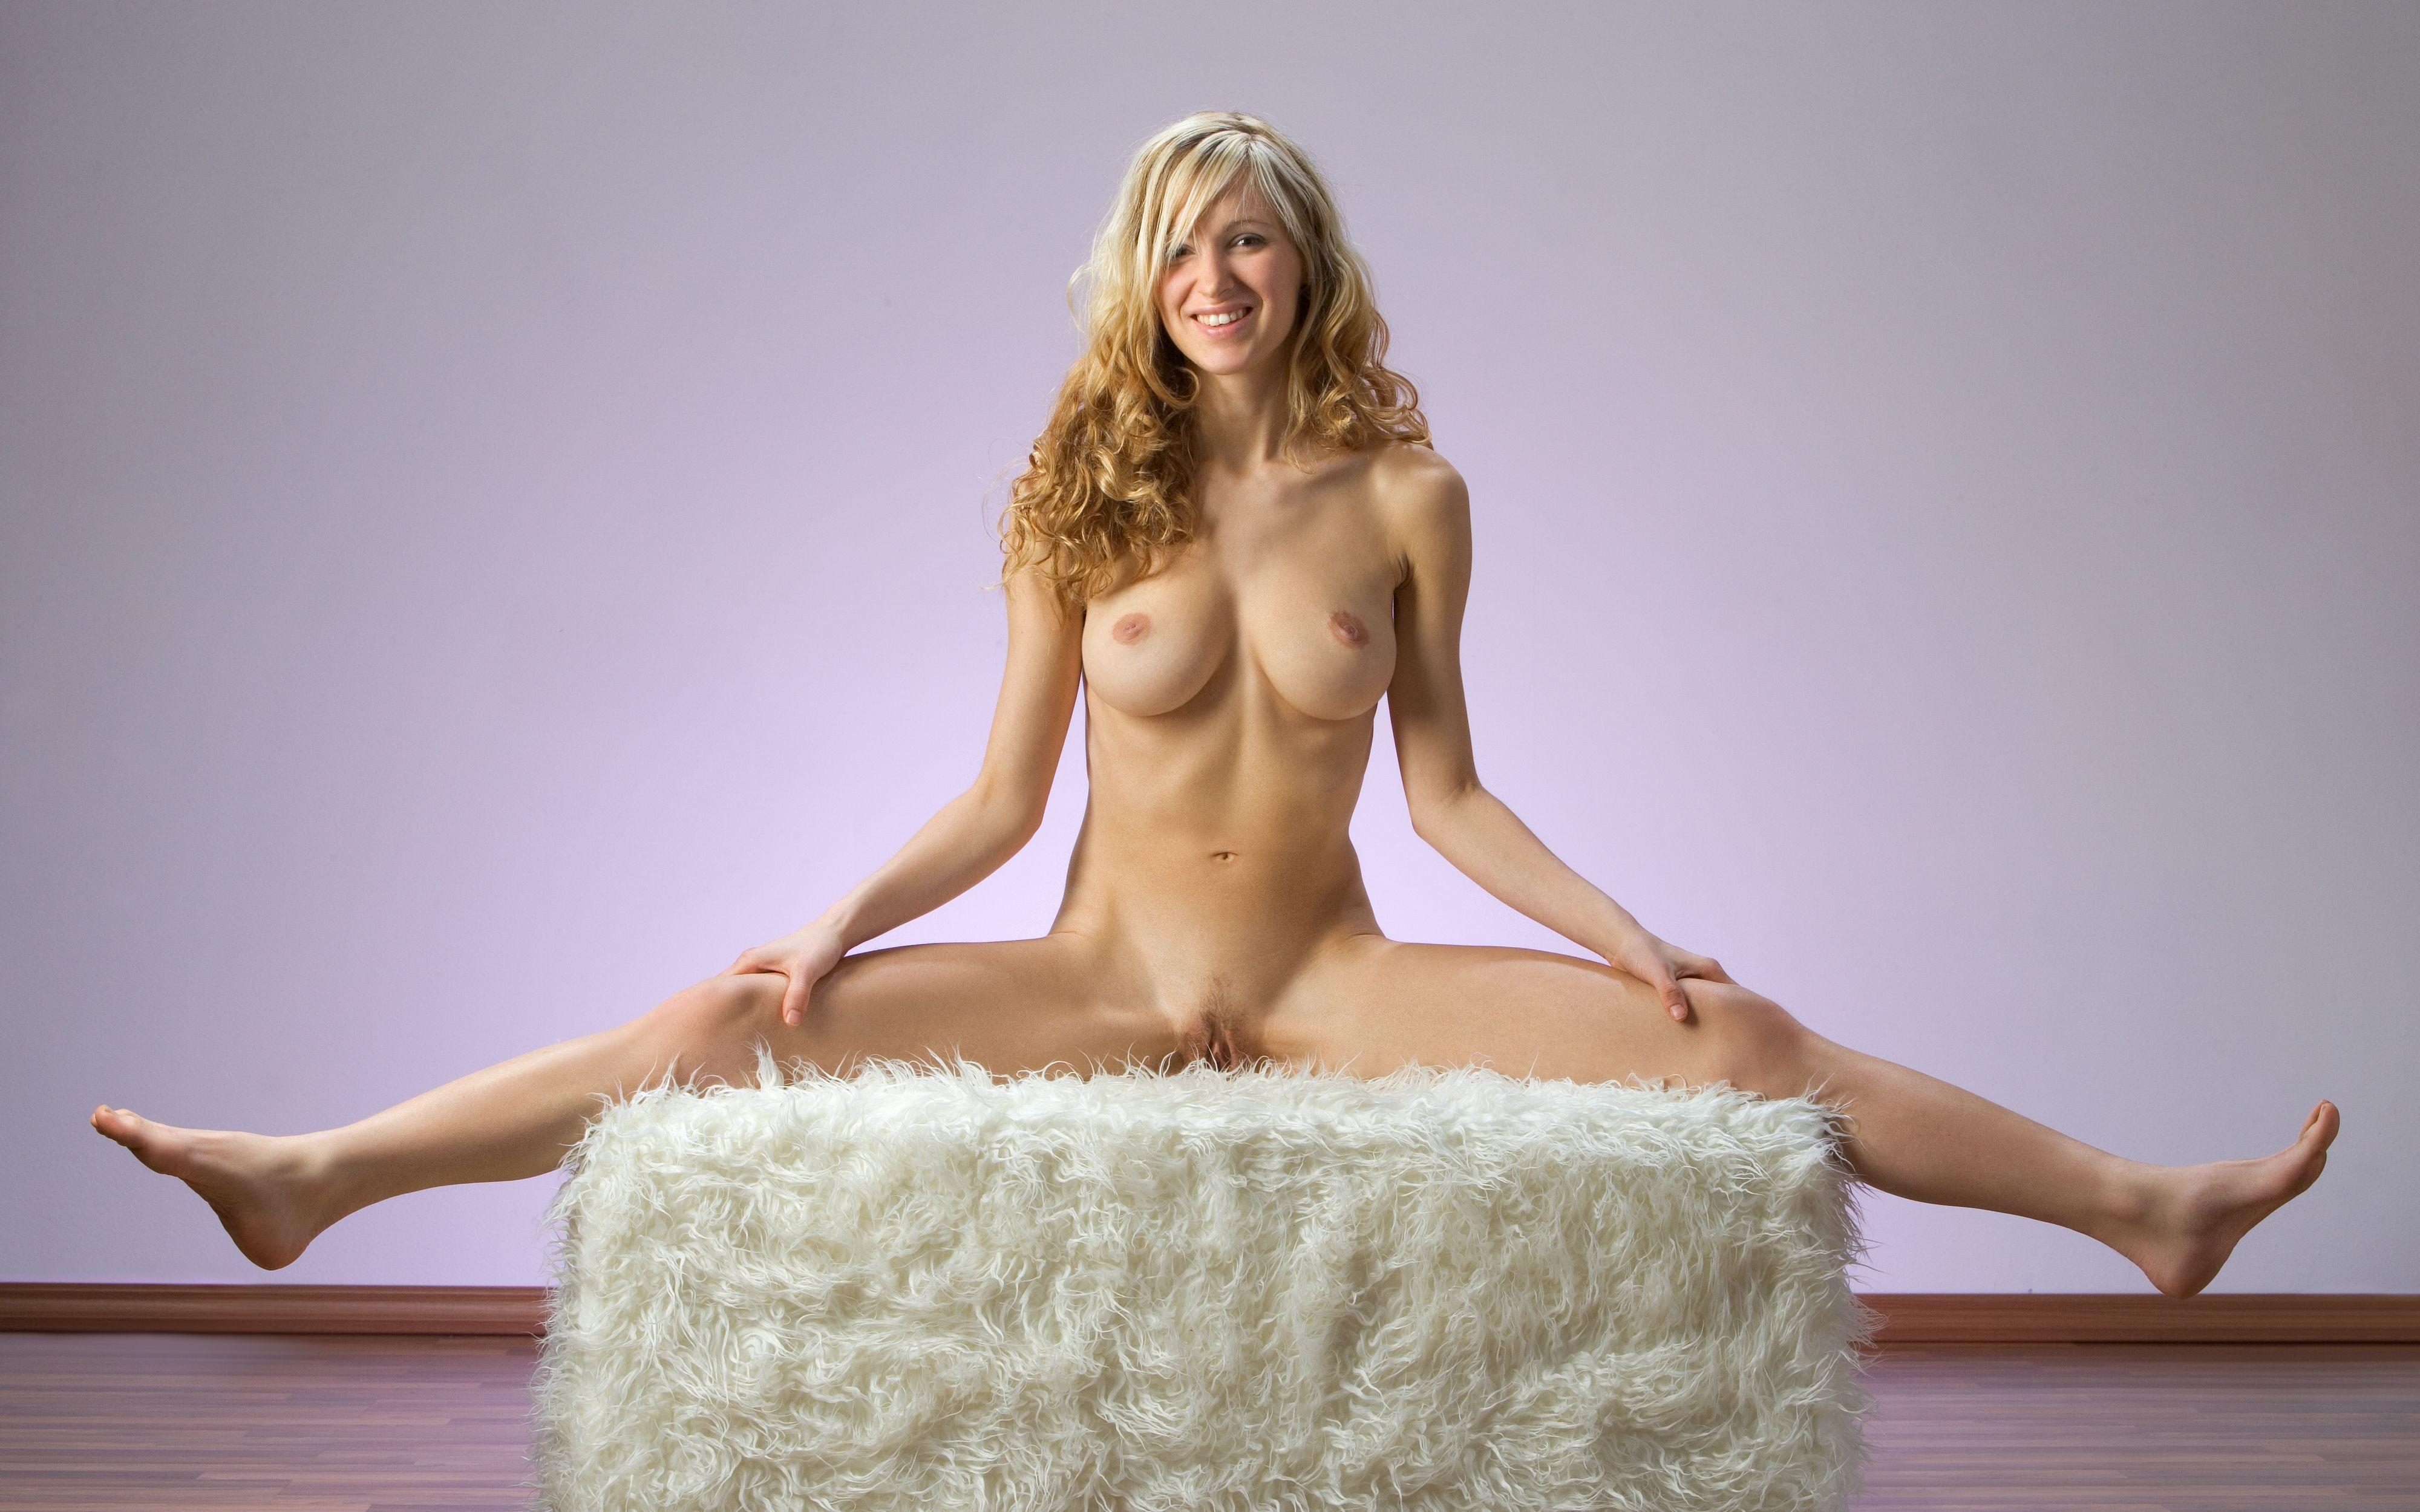 Special case.. corinna femjoy nude girls opinion